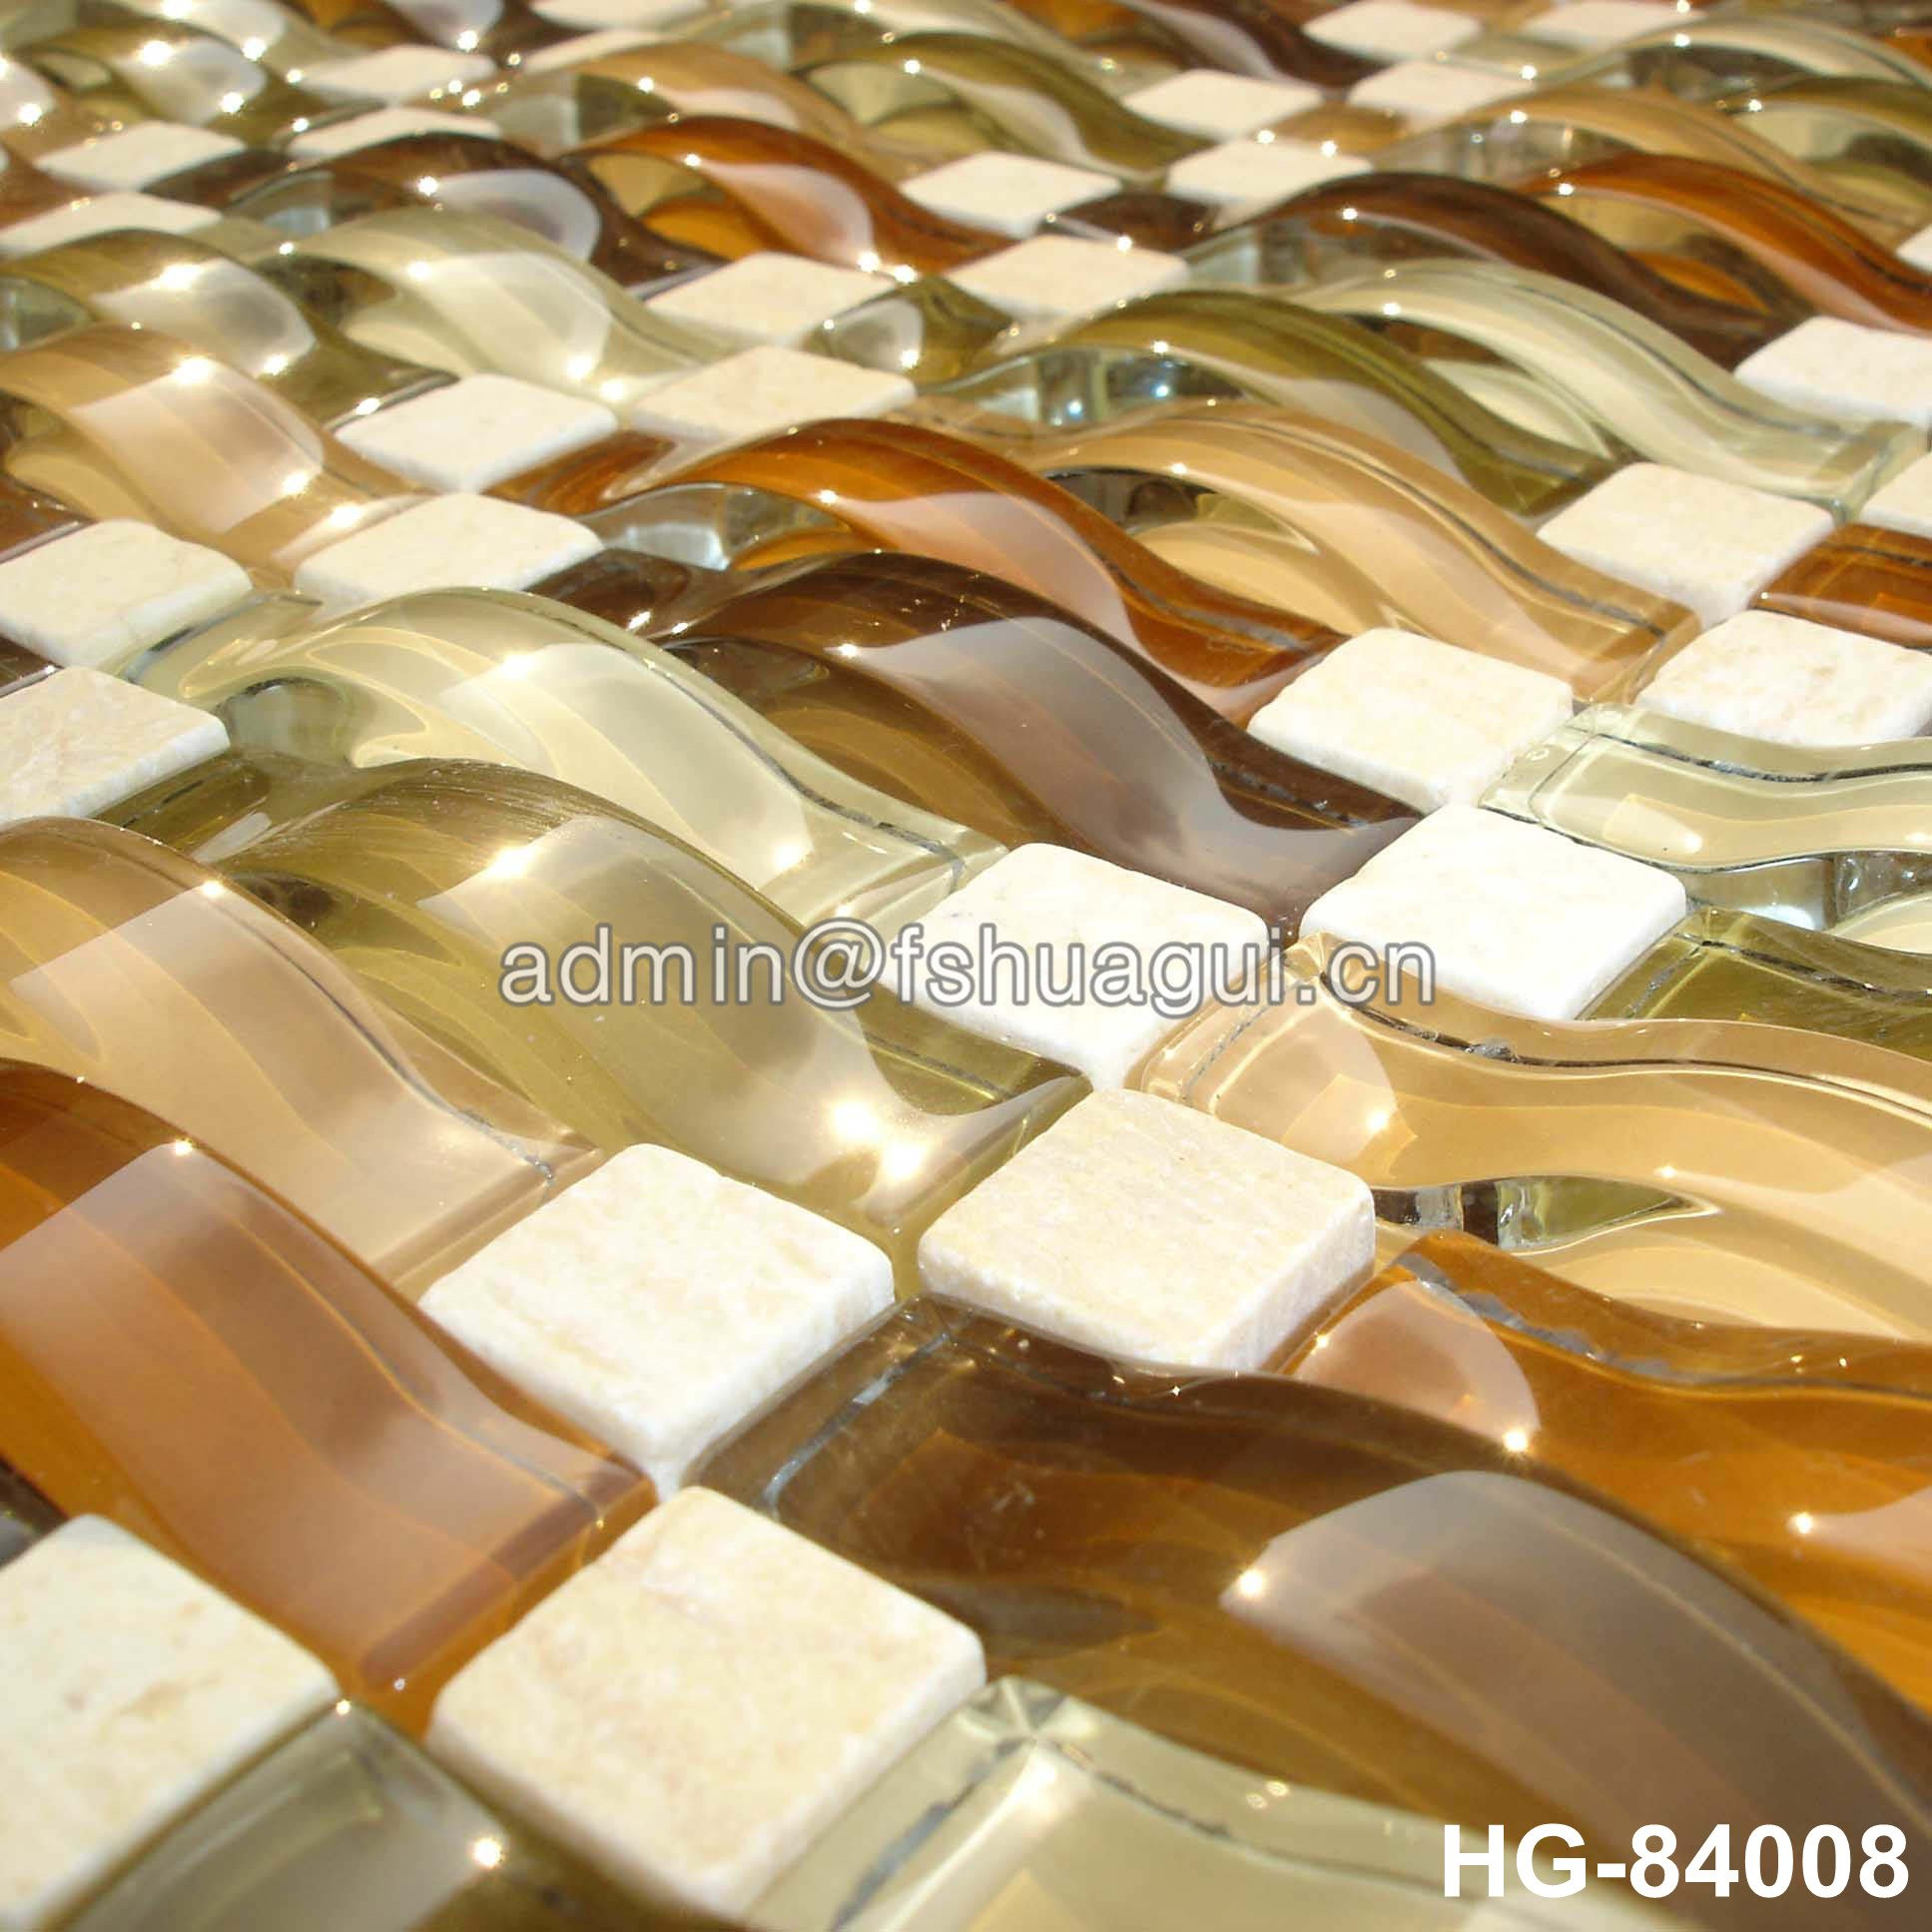 Huagui Glass mosaic tile HG-84019 GLASS MOSAIC TILE image53